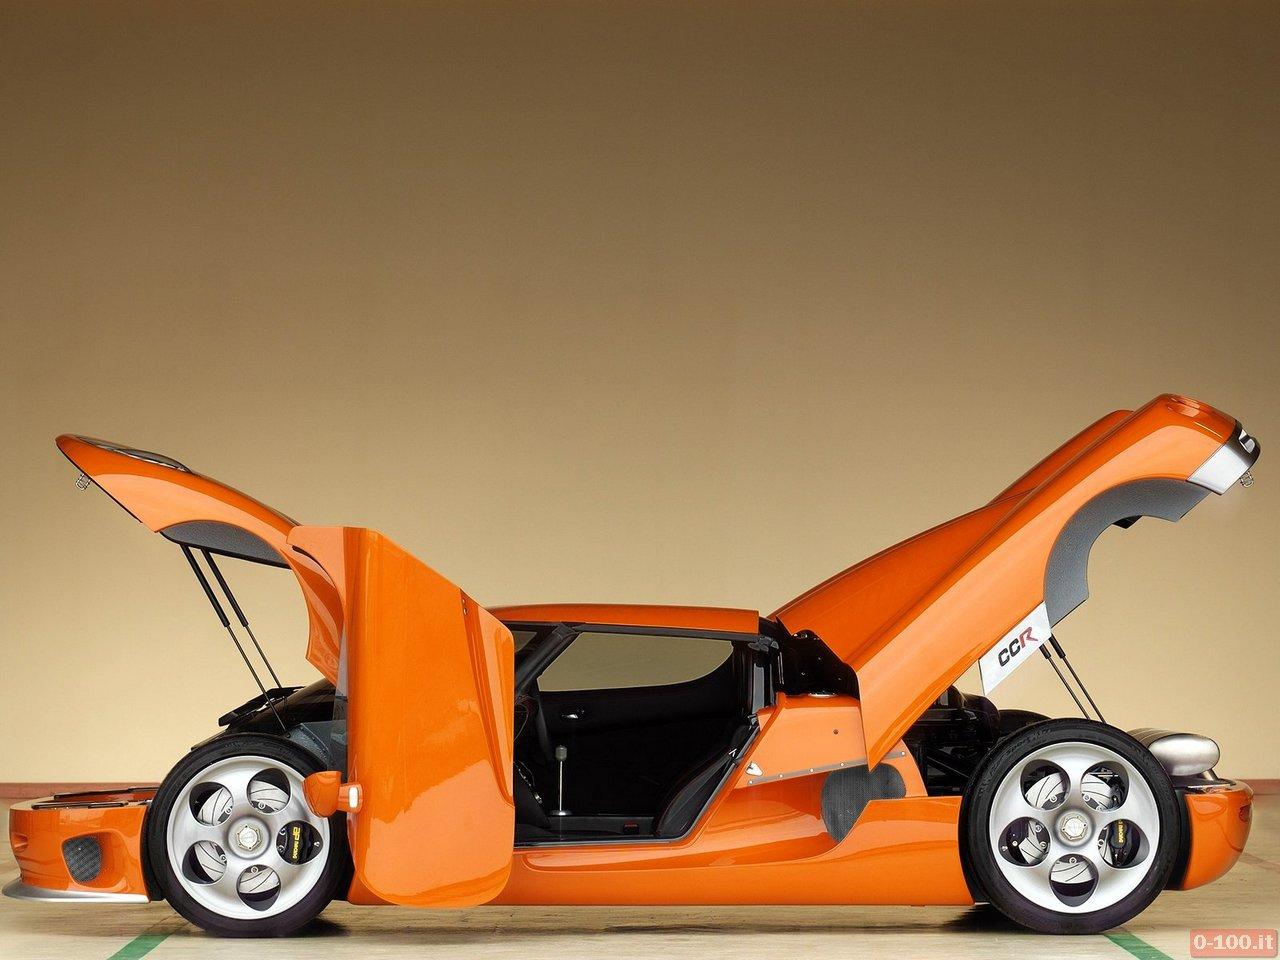 Koenigsegg CCR - 0-100.it